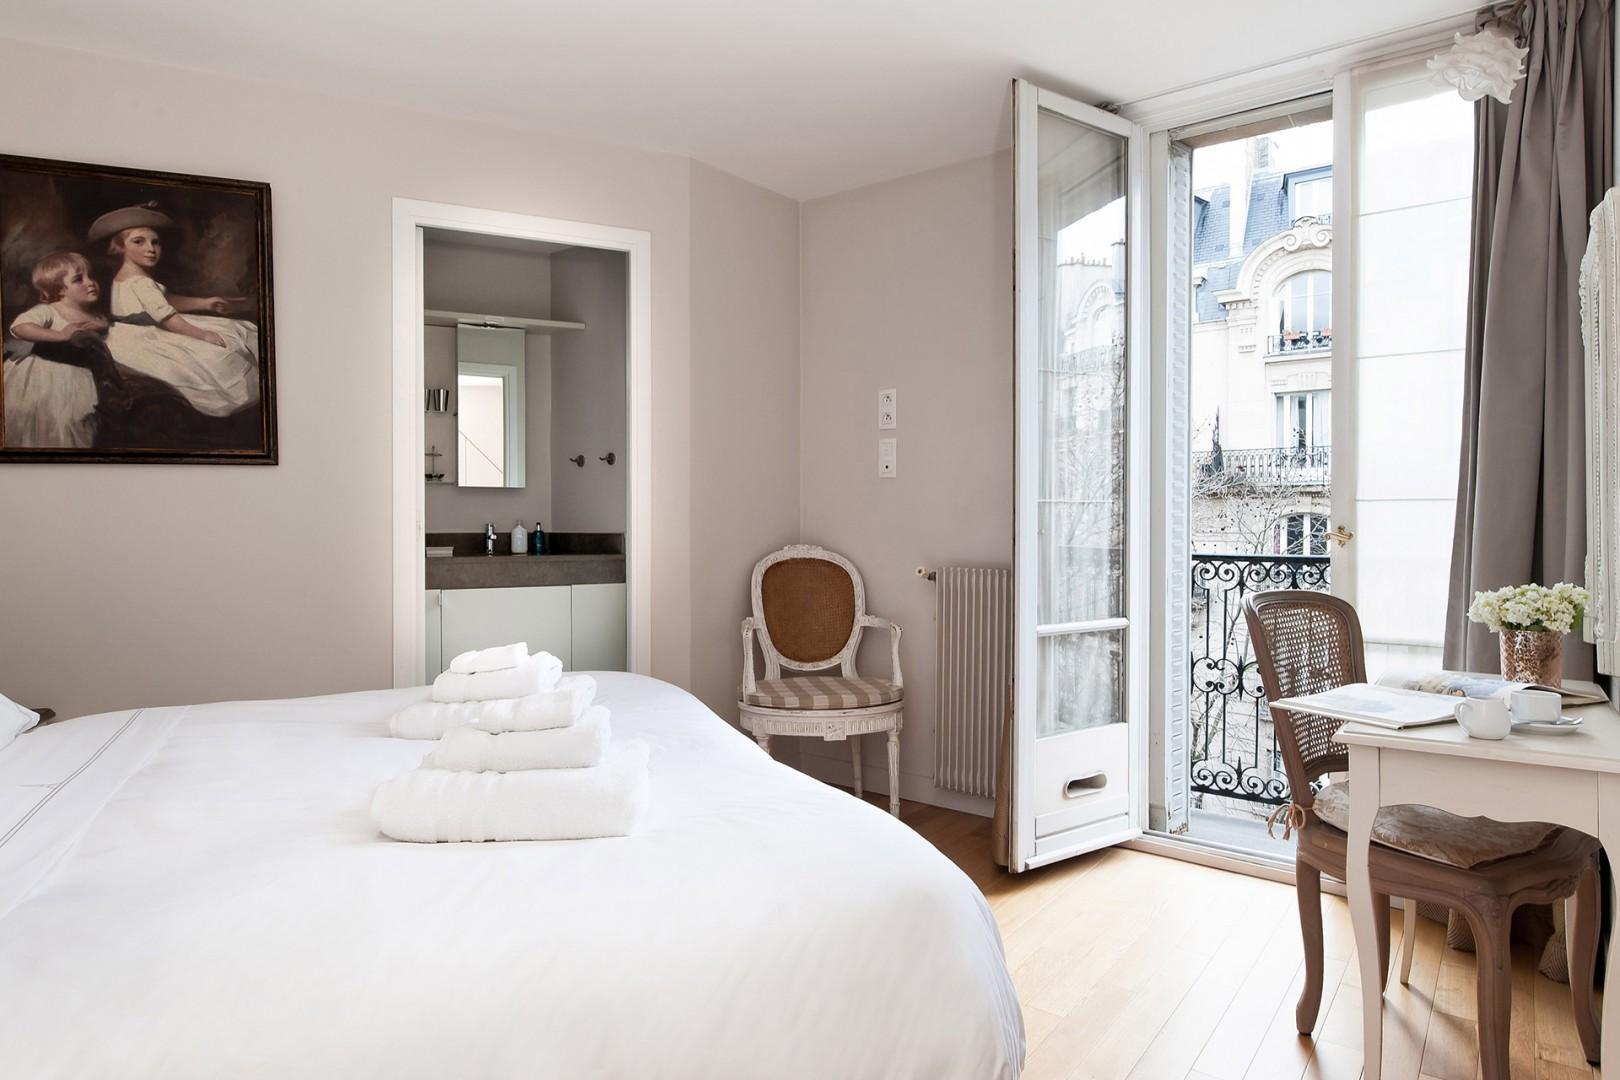 Bedroom 1 has an en suite bathroom, balcony and Eiffel Tower views!